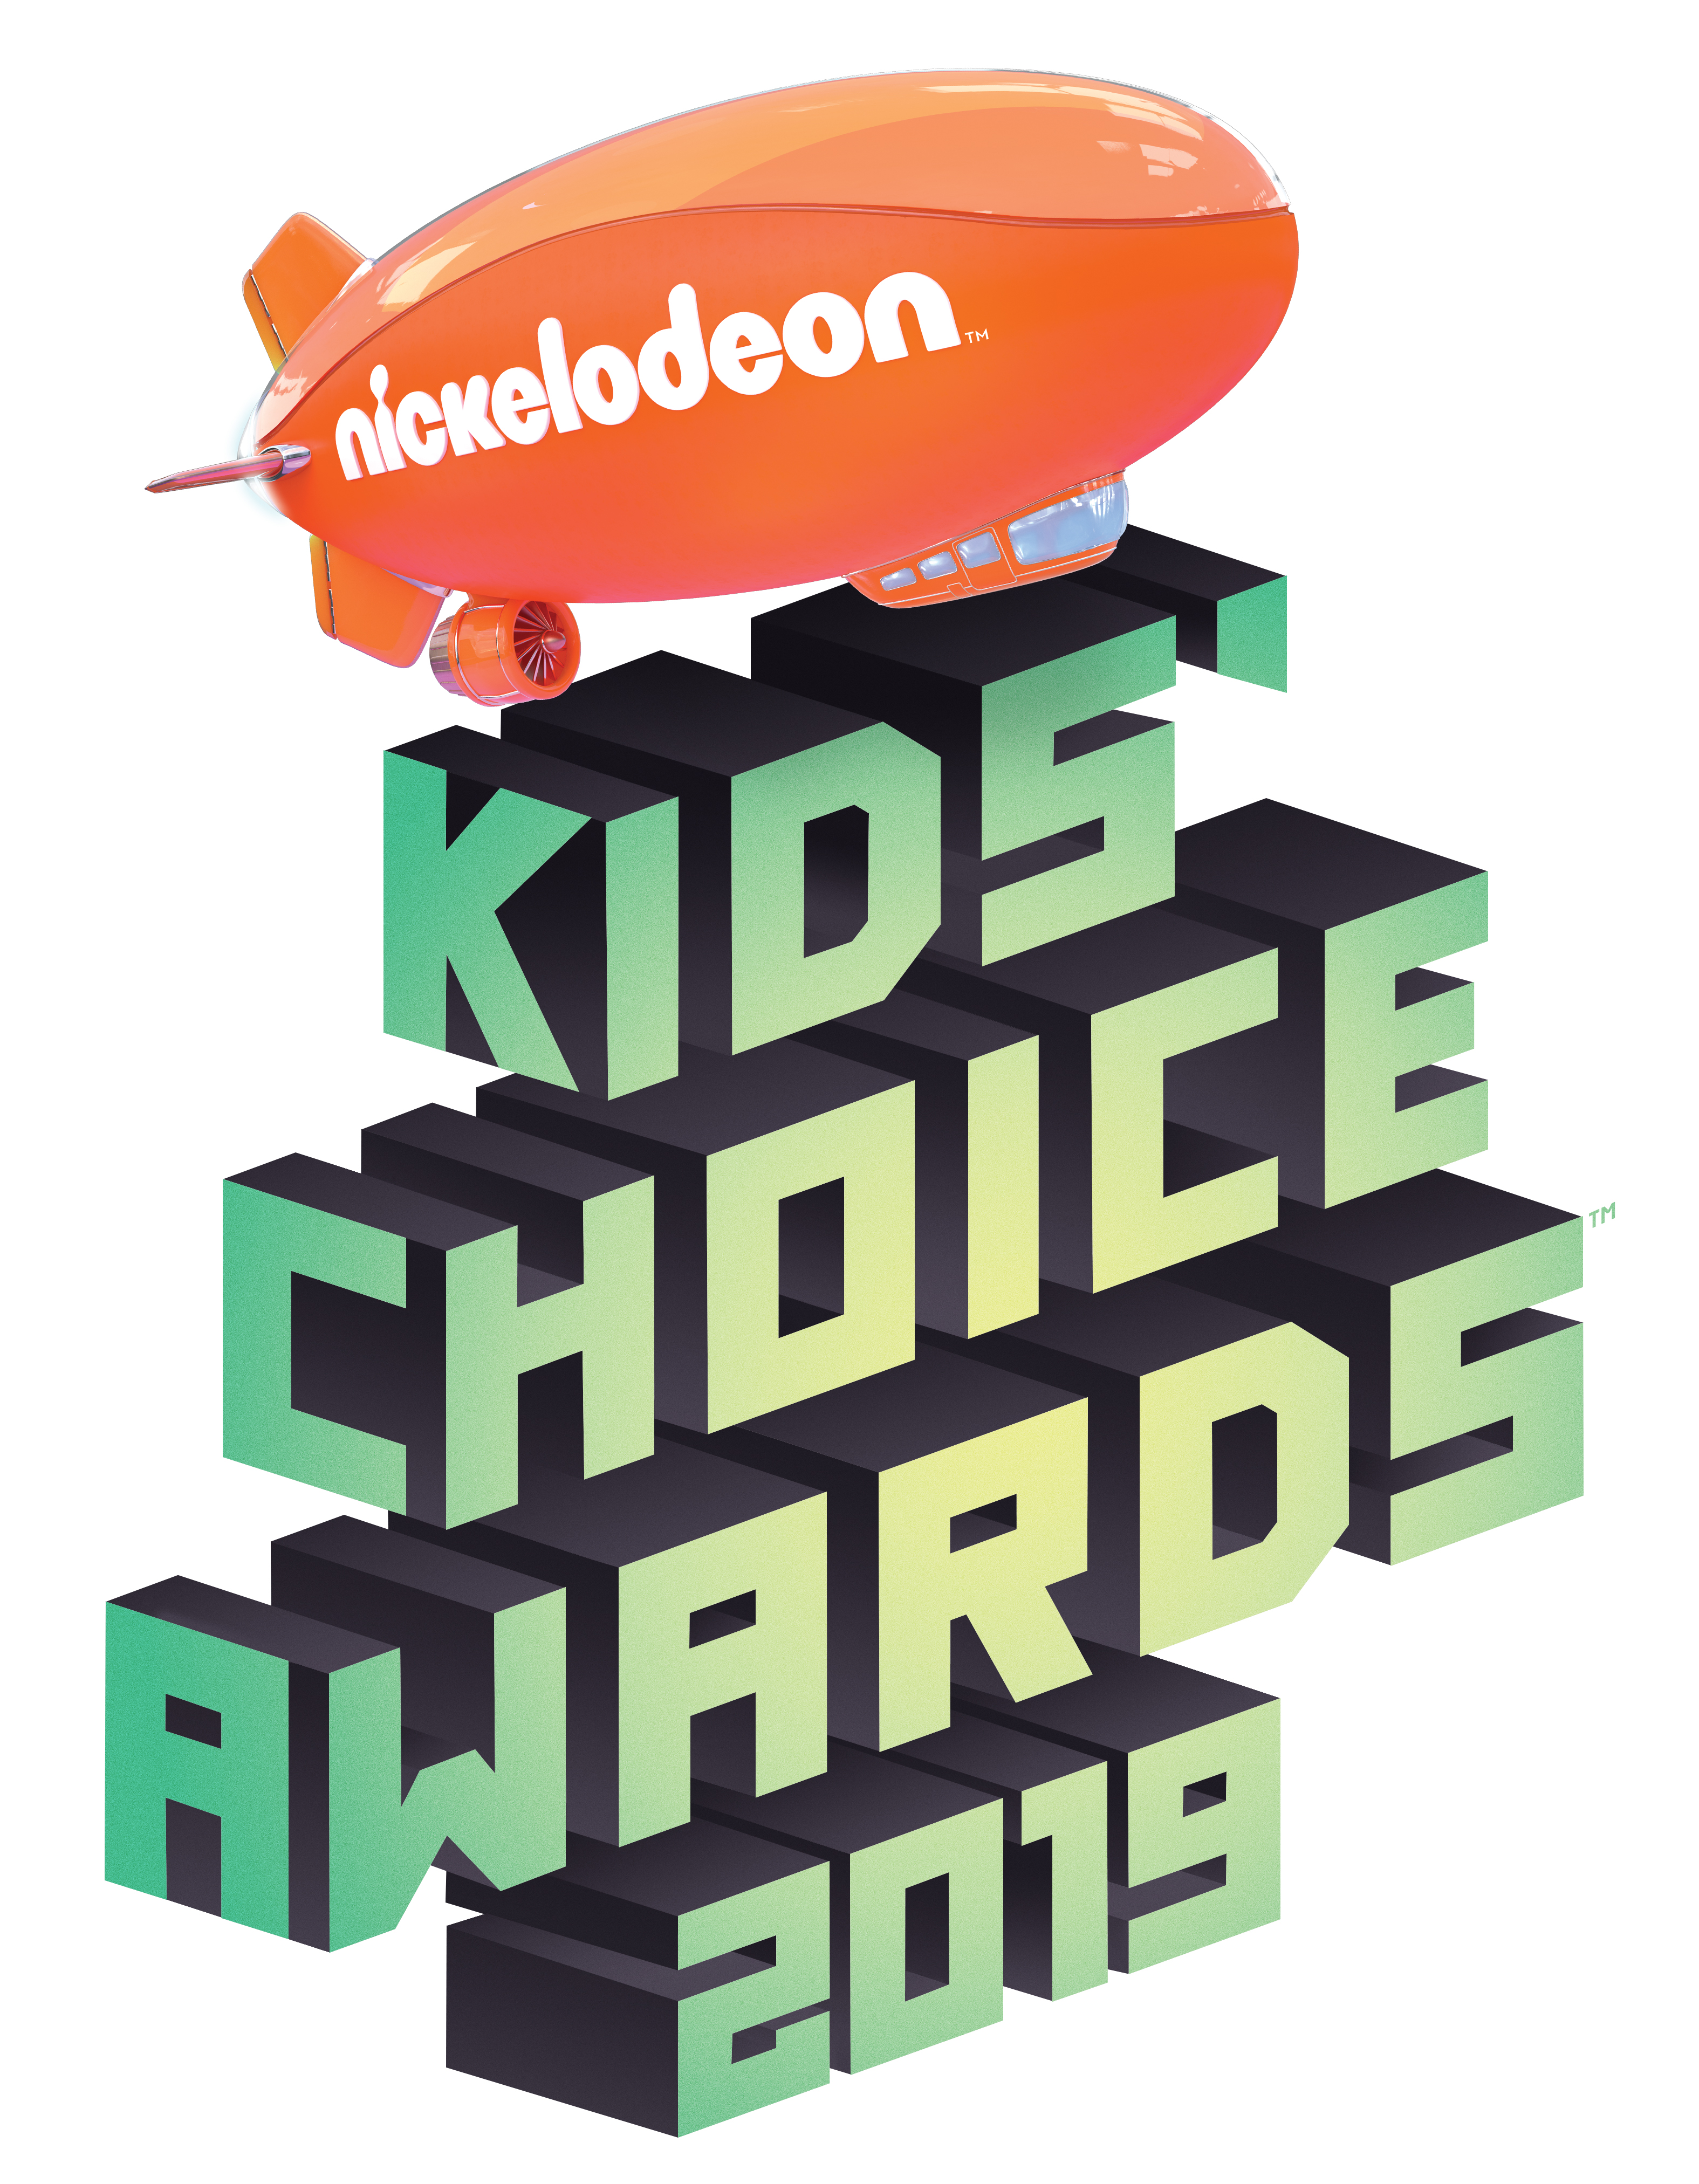 Nickelodeon Kids' Choice Awards 2019 (2019) - IMDb